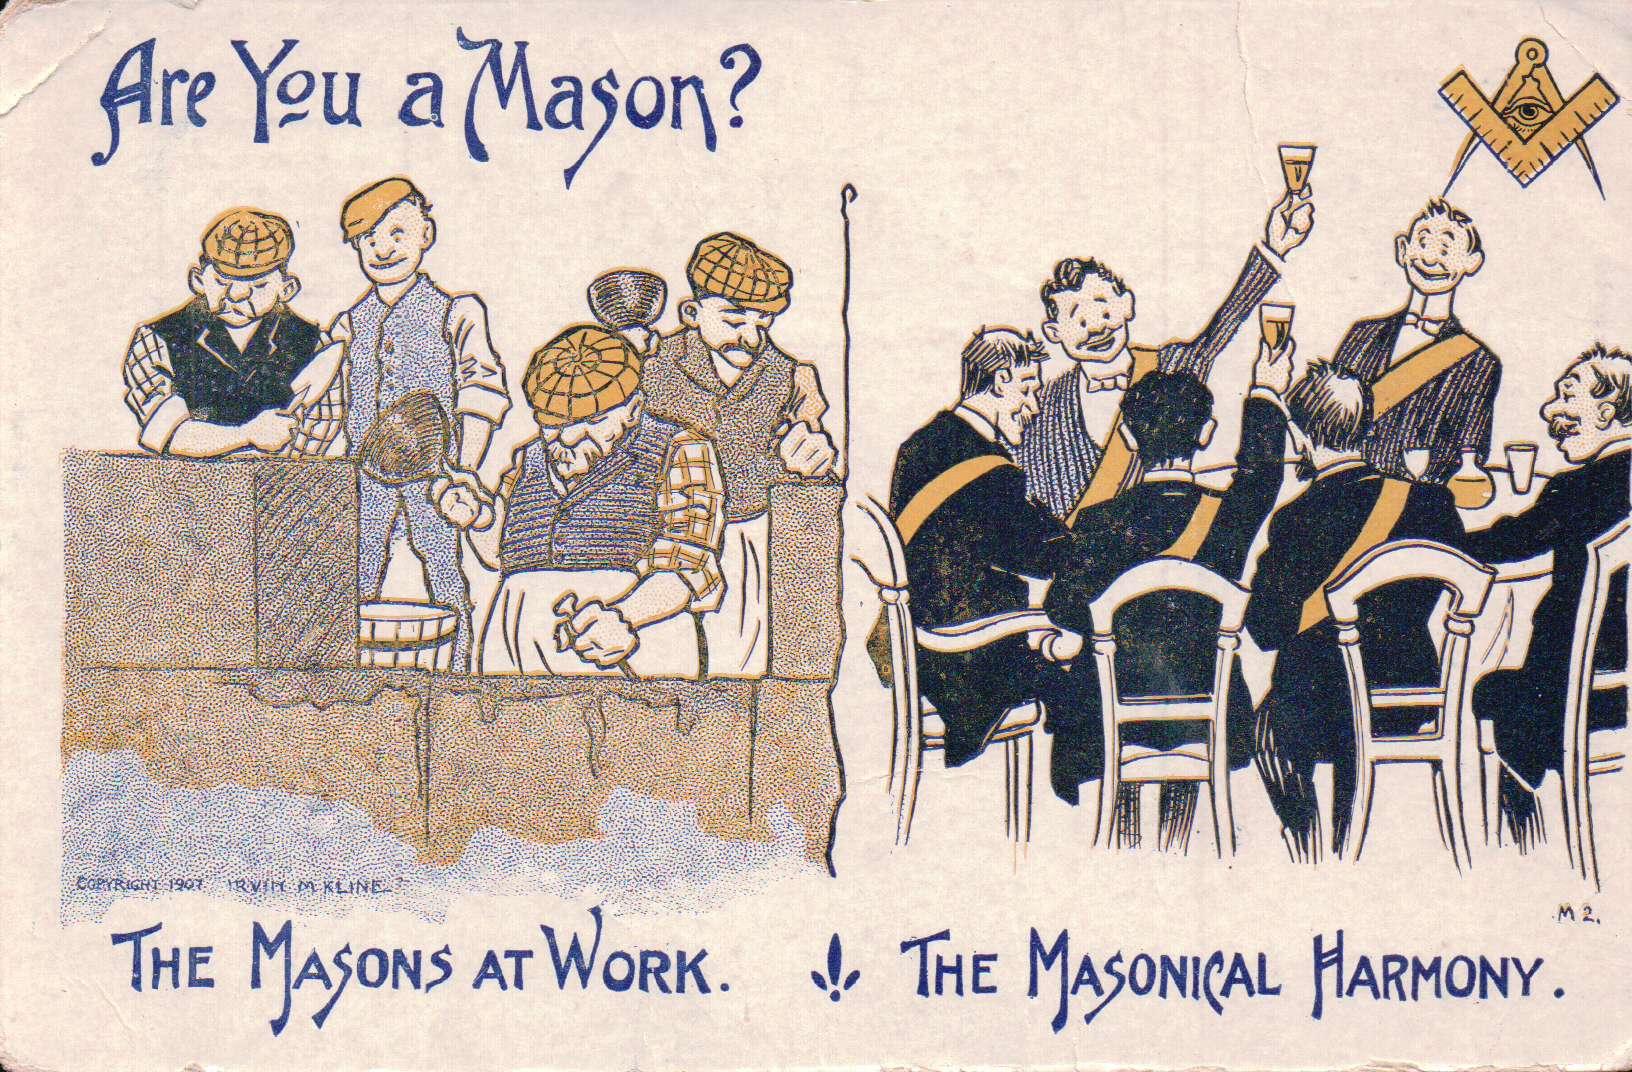 http://memberfiles.freewebs.com/08/52/104195208/photos/Masonic-Postcards/EK_0002.JPG